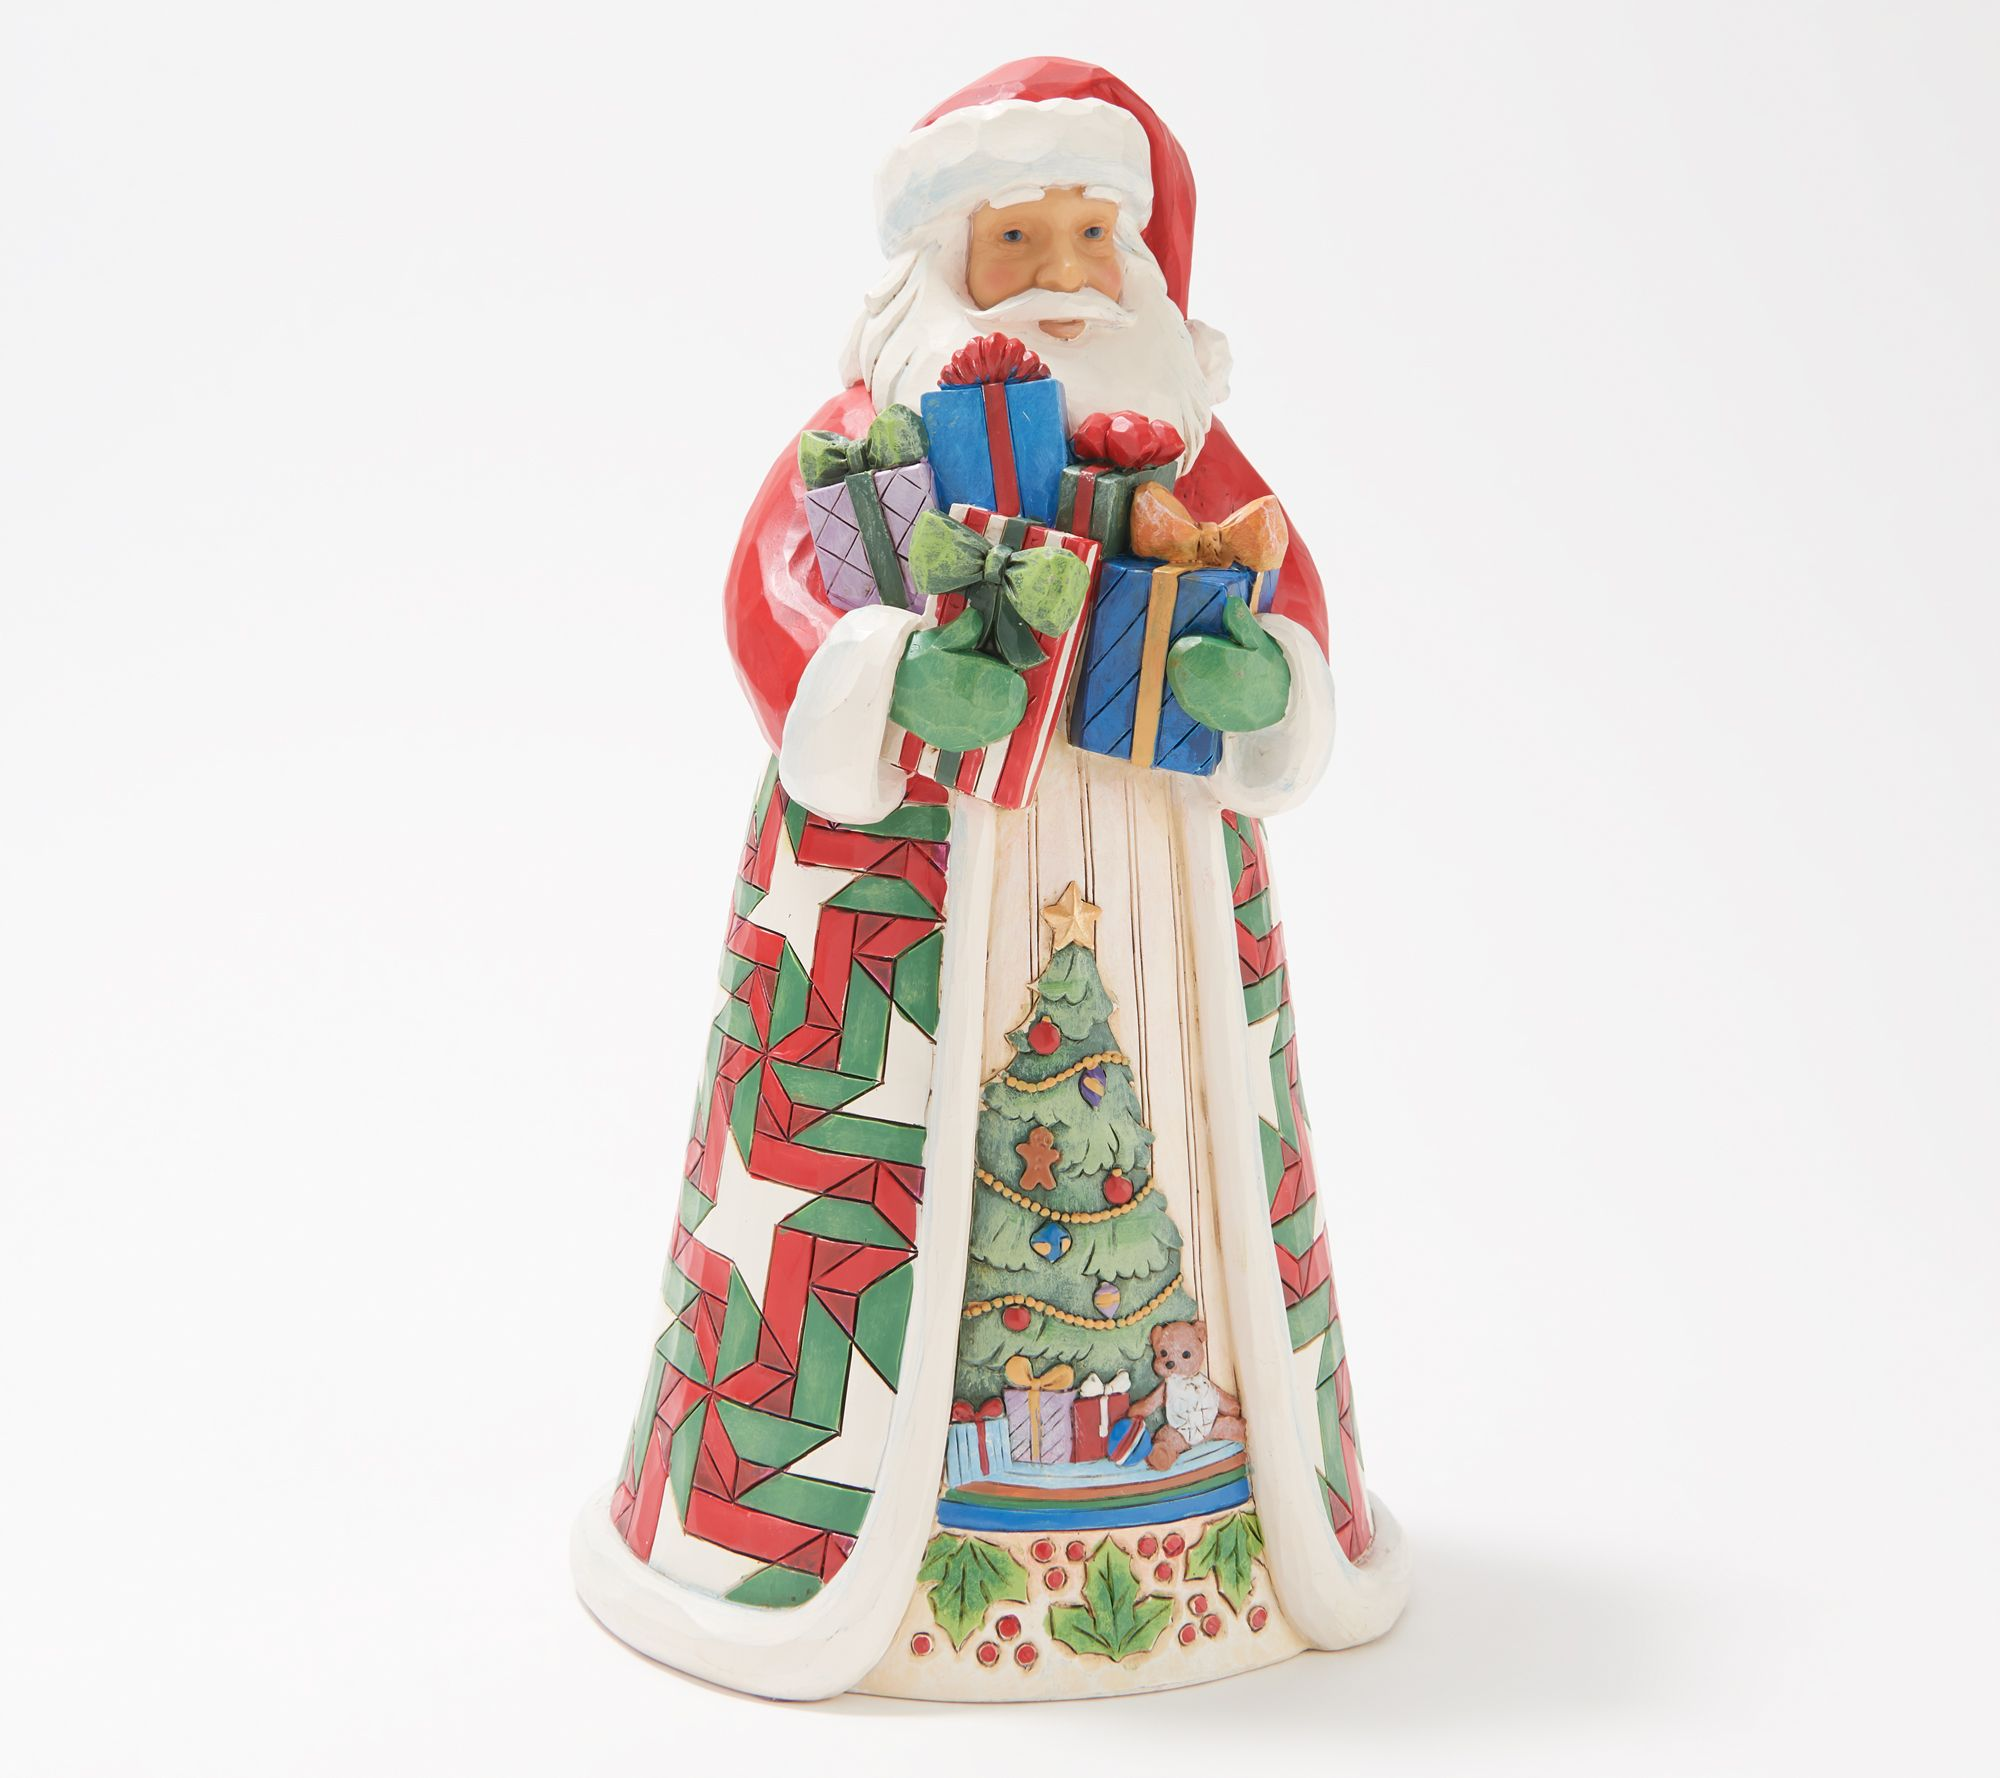 HARLEY DAVIDSON CHRISTMAS CARDS #X425 SANTA BEAR WITH GIFTS ON HARLEY 10